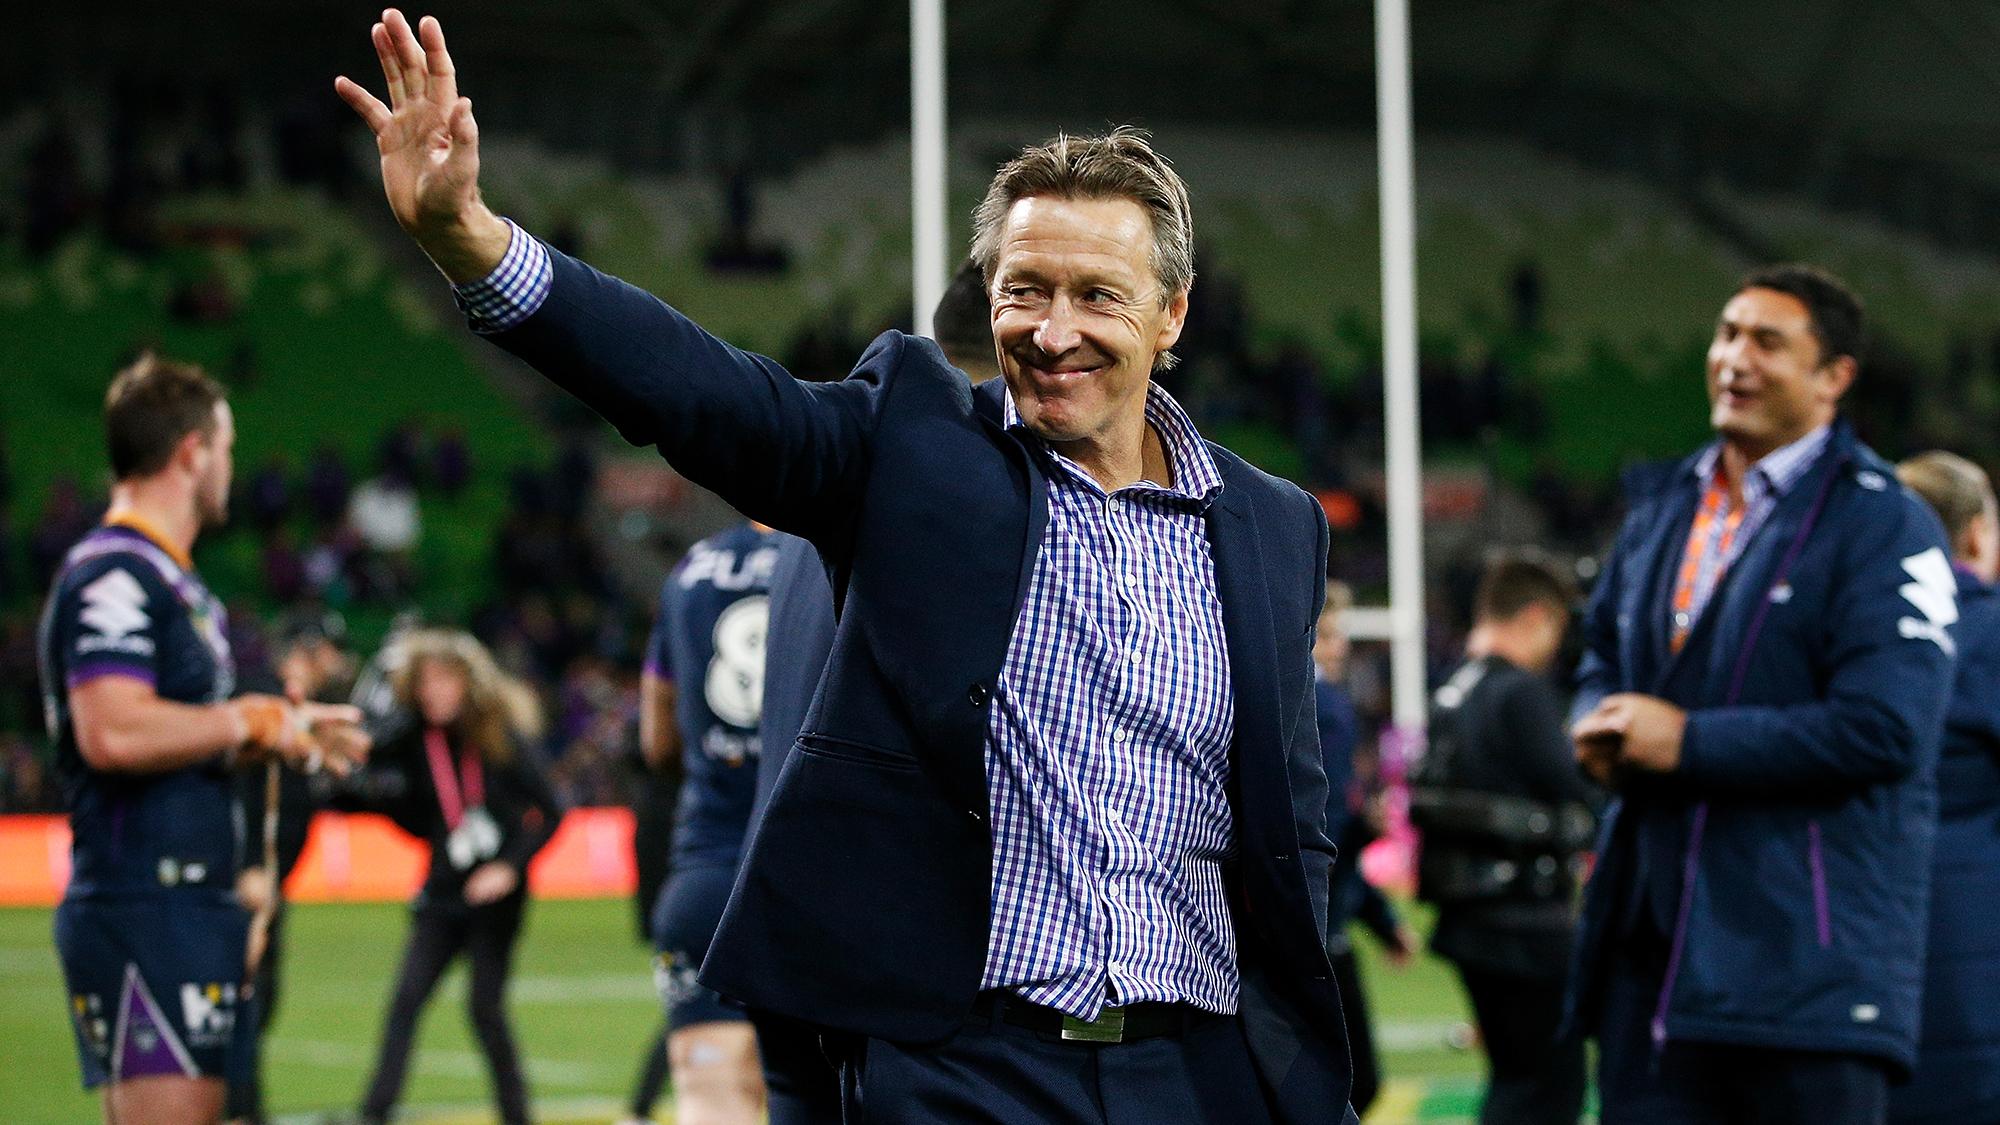 Craig Bellamy open to coaching in AFL in post-NRL career